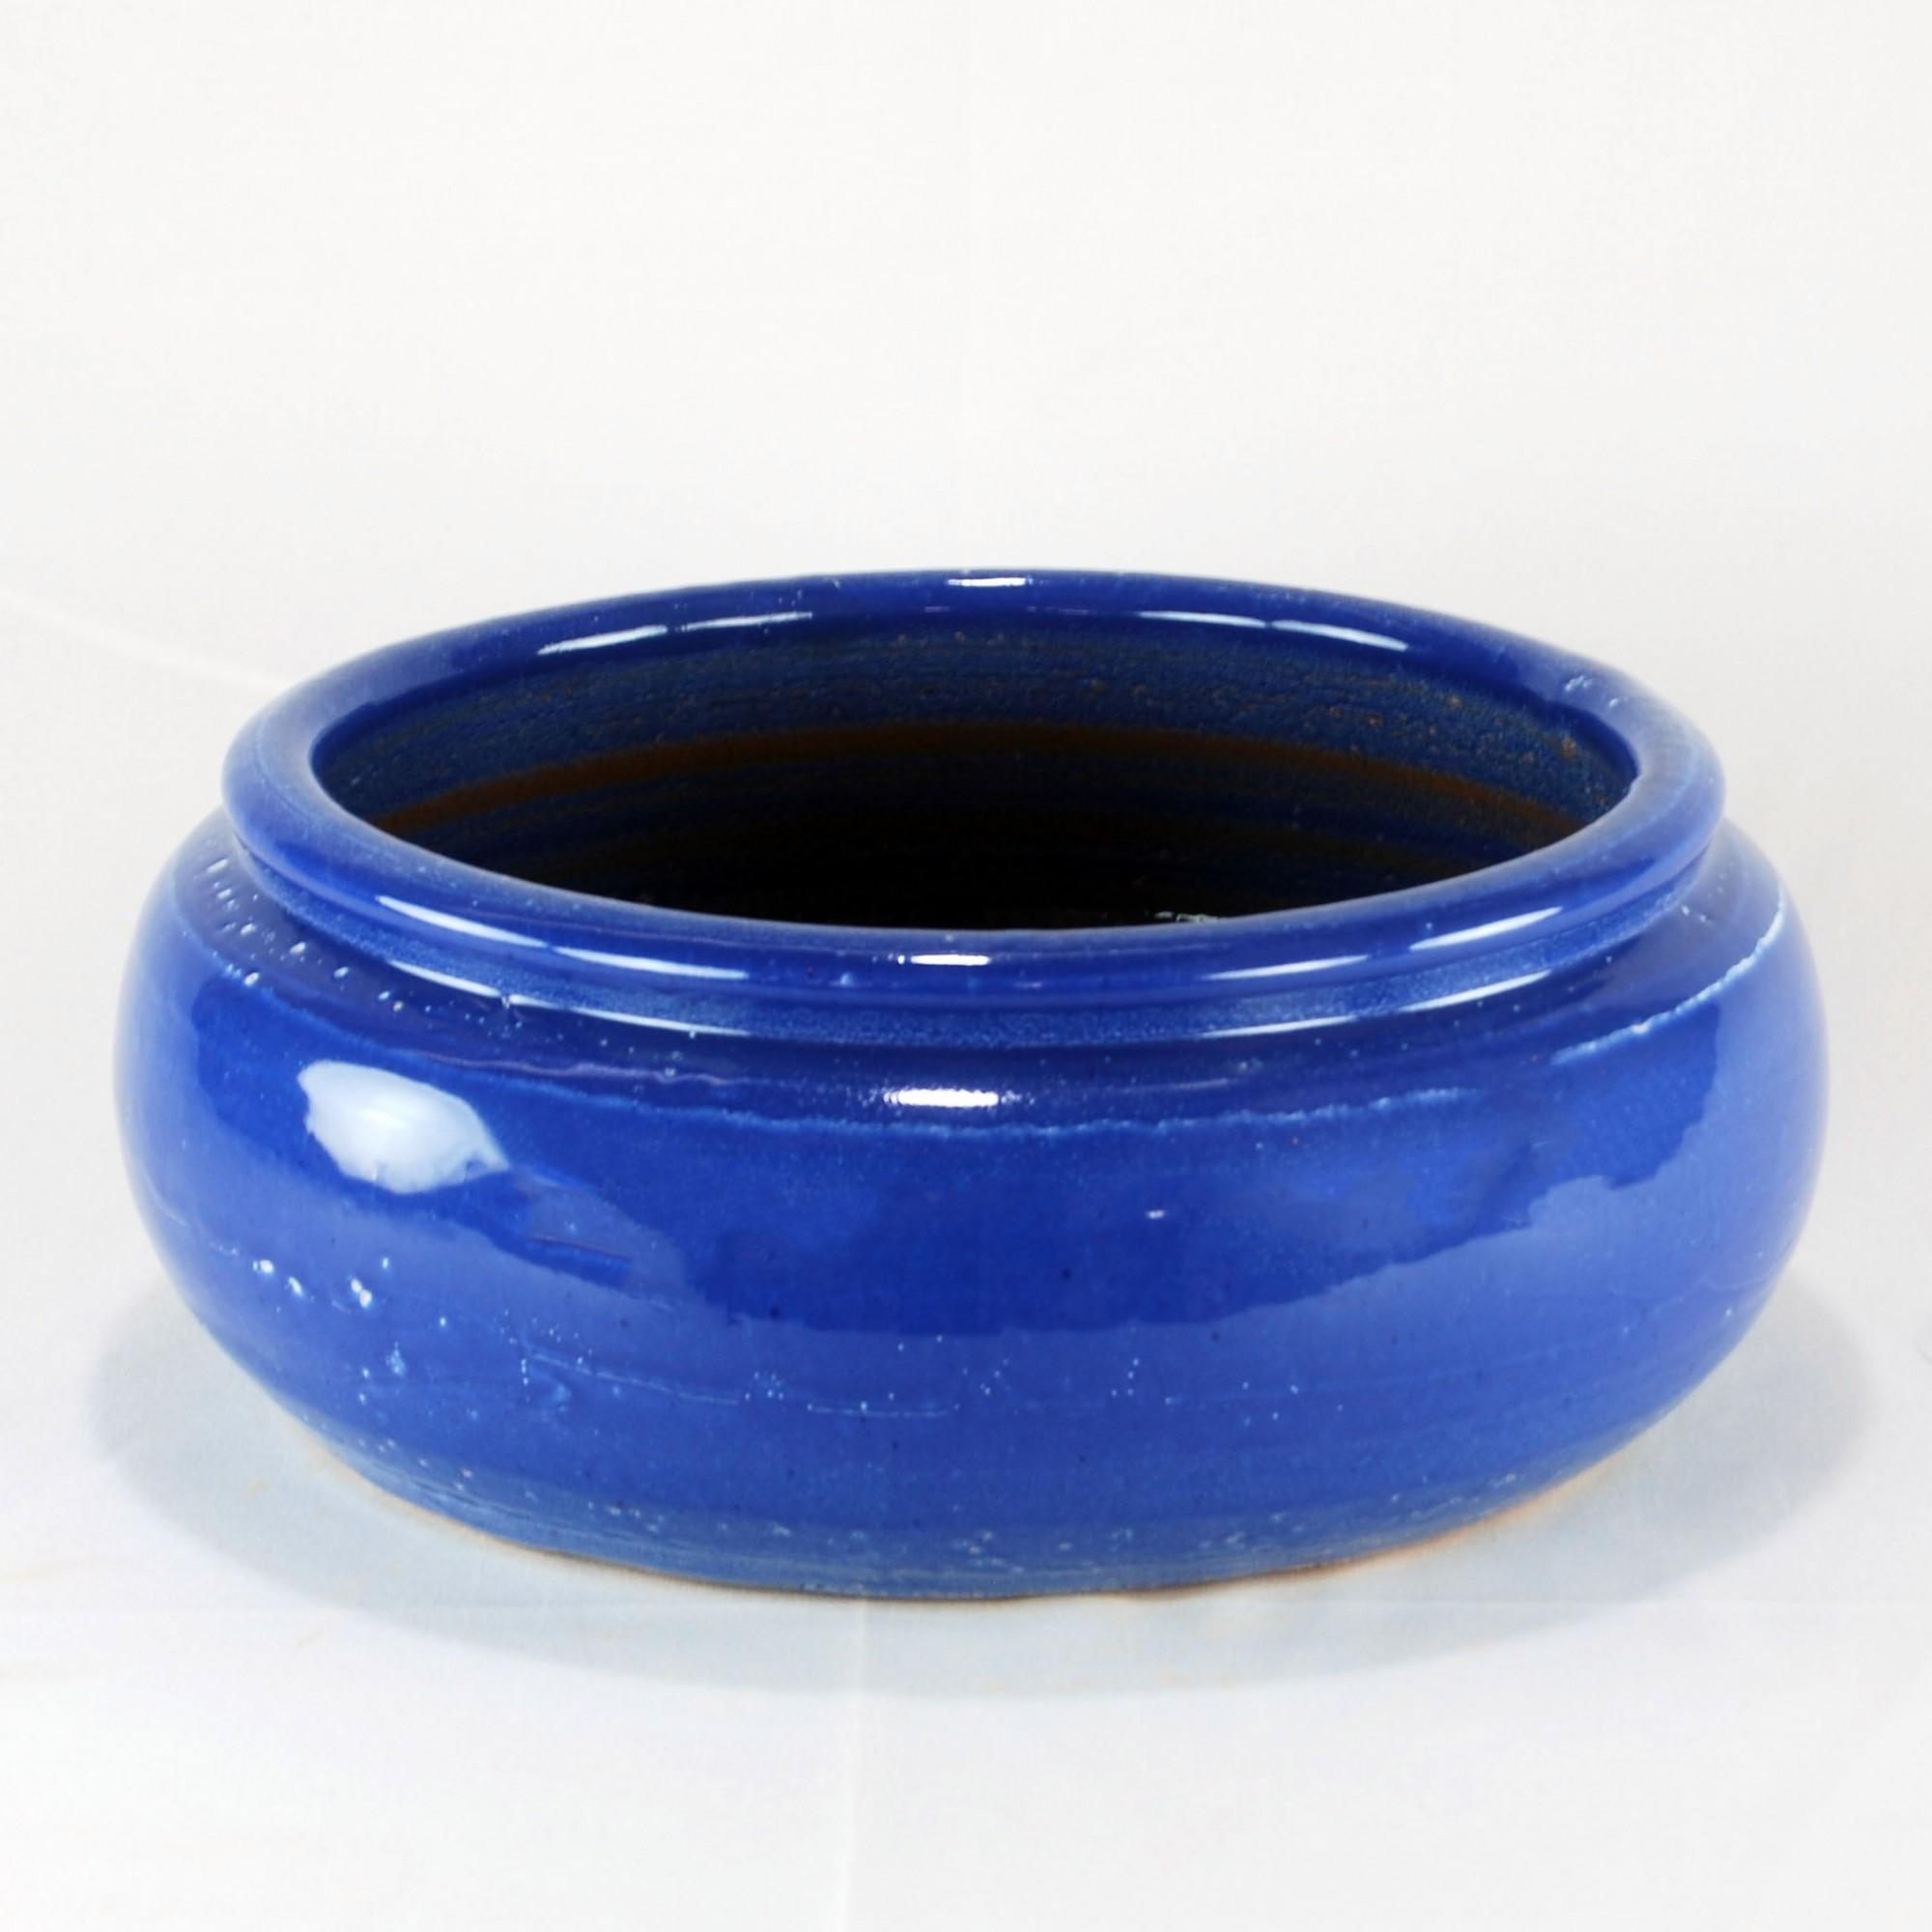 Vaso Esmaltado Bacia Borda - M - Azul Real